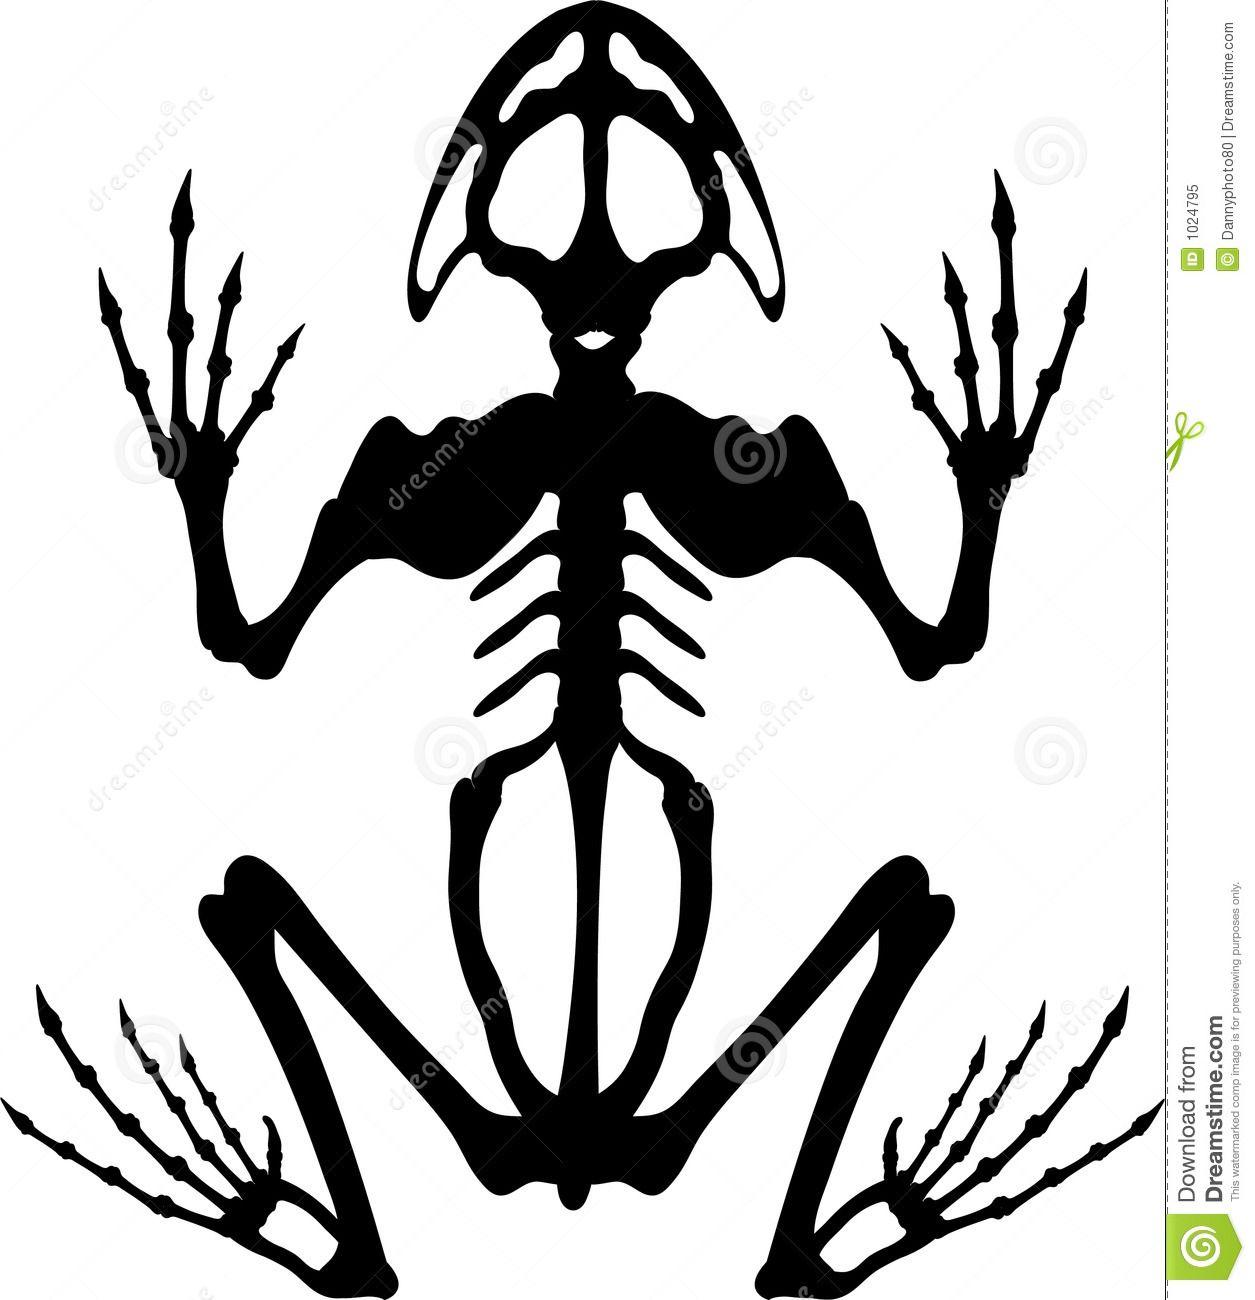 Frog skeleton clipart jpg transparent download Frog Skeleton Royalty Free Stock Photos - Image: 15917488 | Tattoo ... jpg transparent download